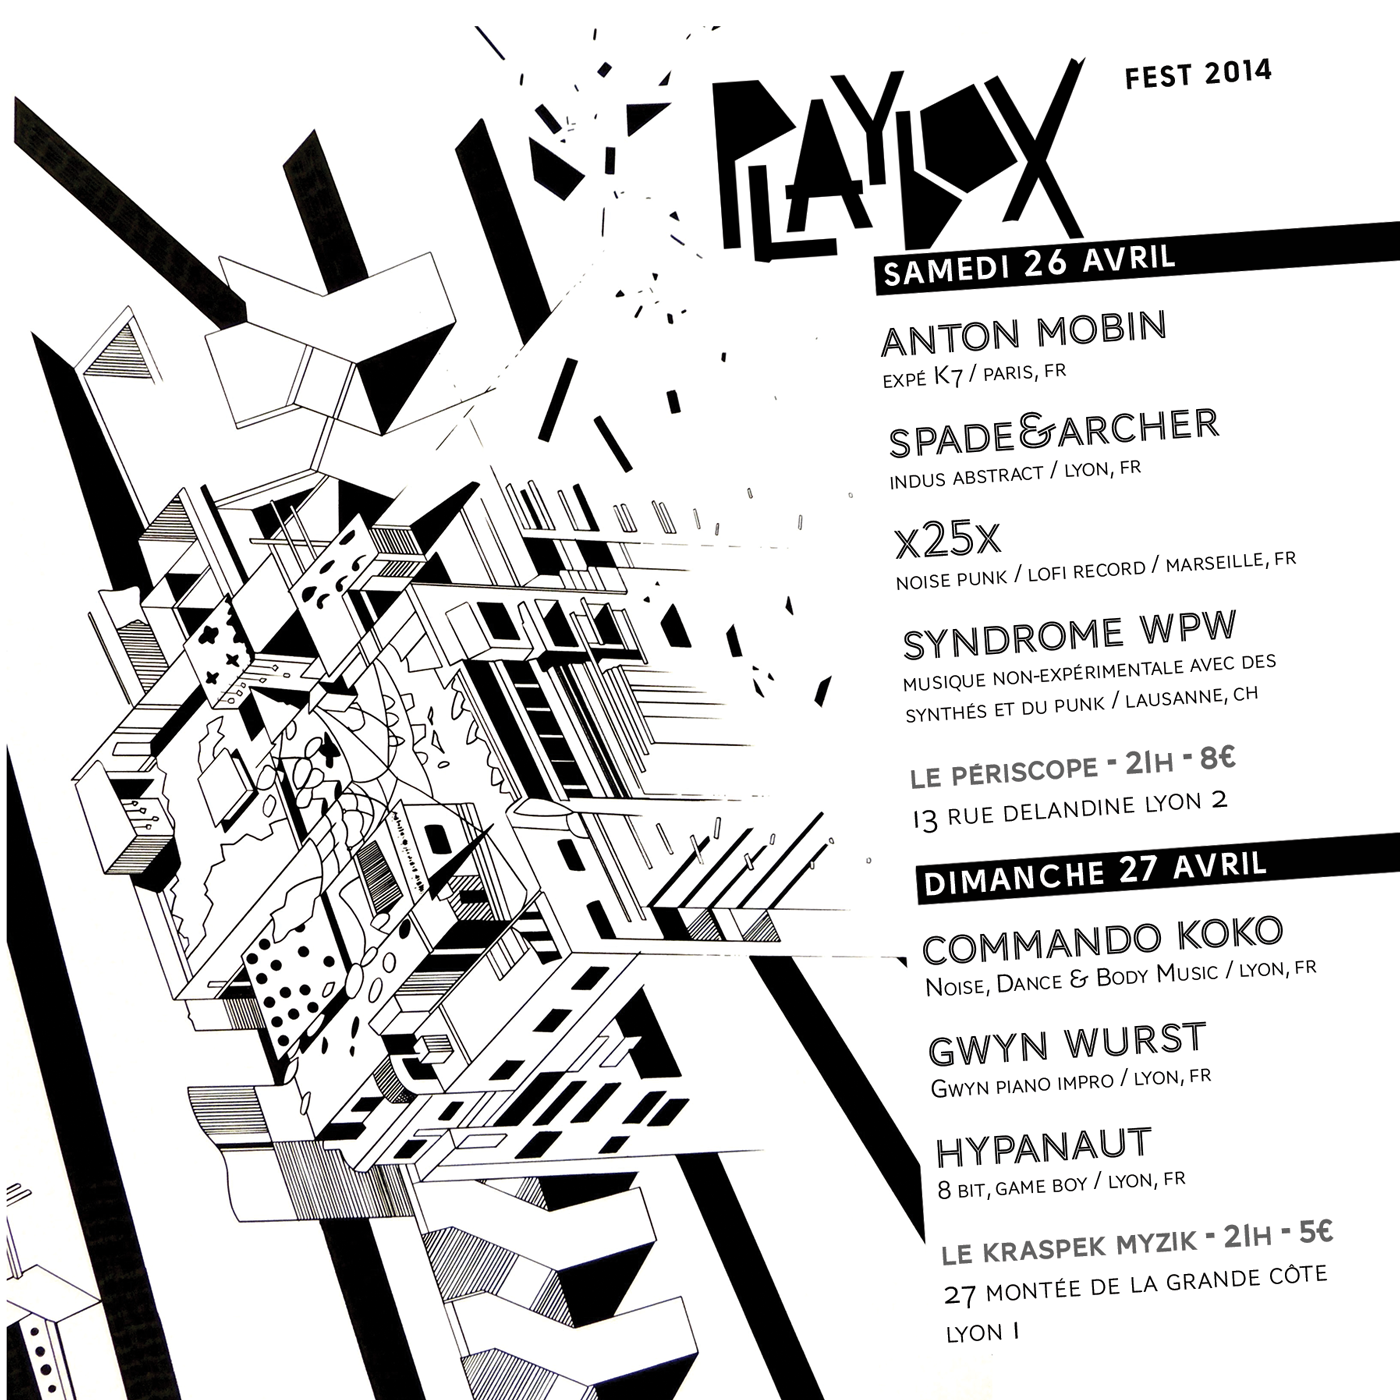 festival playbox 2014